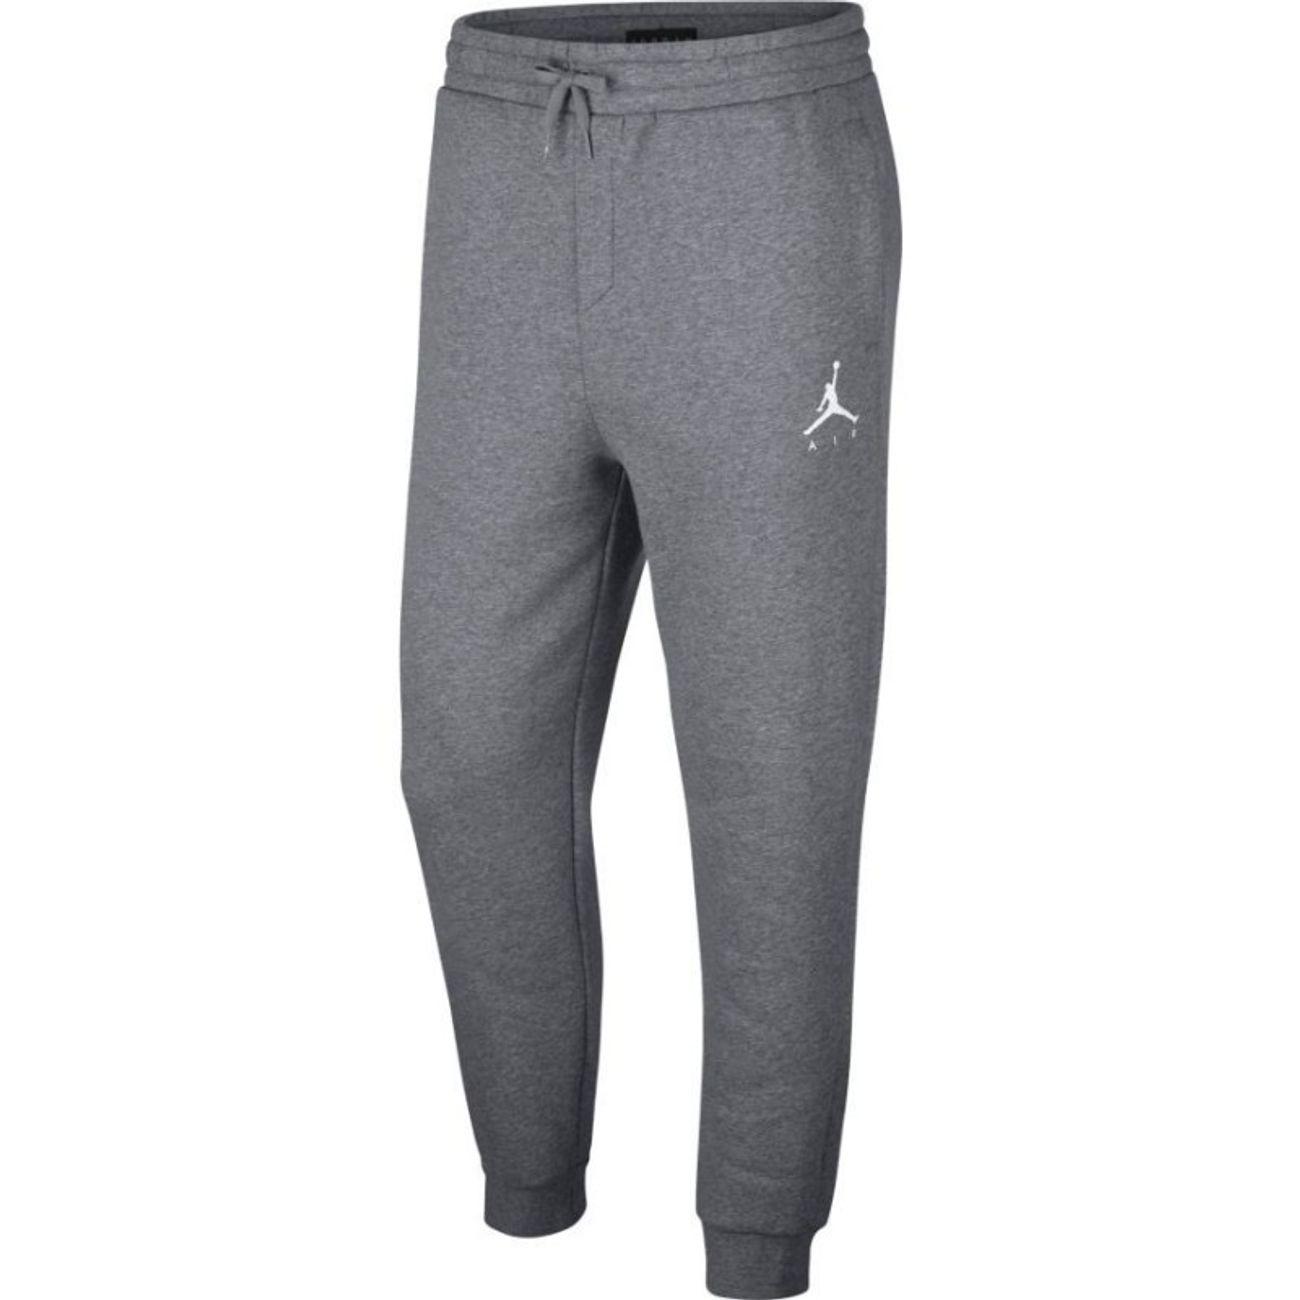 Mode- Lifestyle adulte JORDAN Pantalon Jordan Jumpman Fleece gris pour homme Taille - XXL